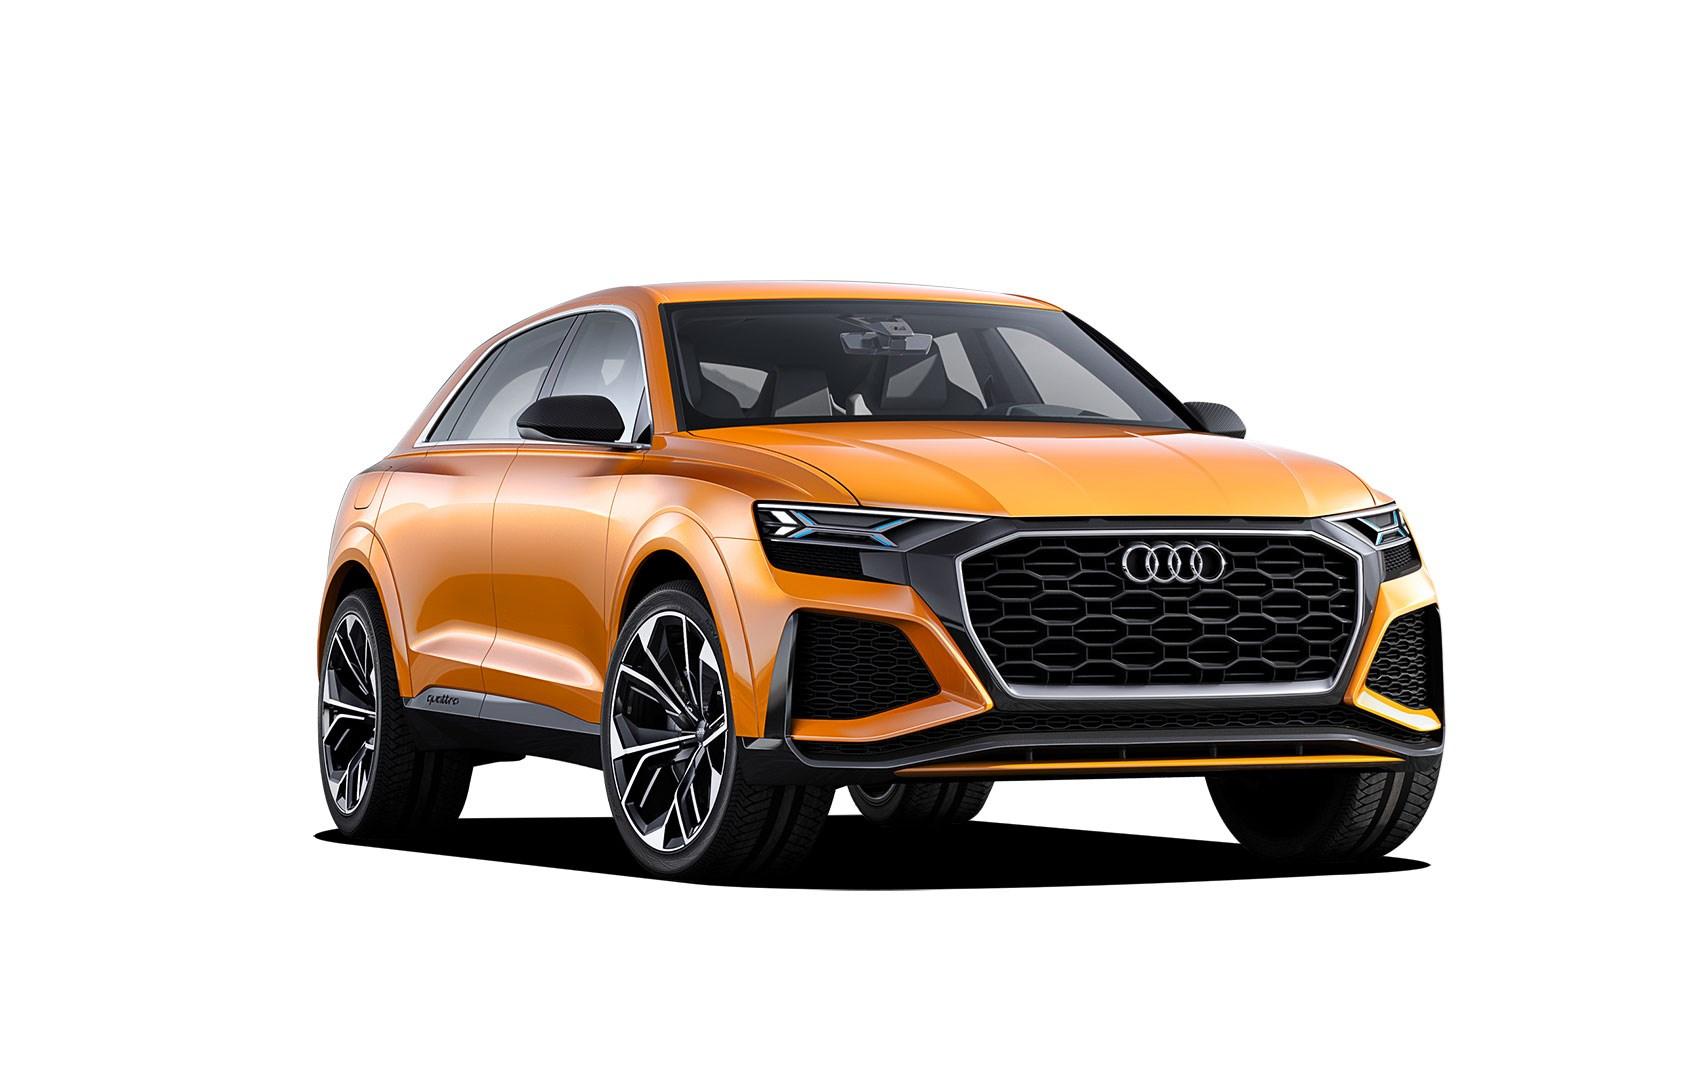 Audi Q8 The Tech Secrets Of Audi's New Suv By Car Magazine